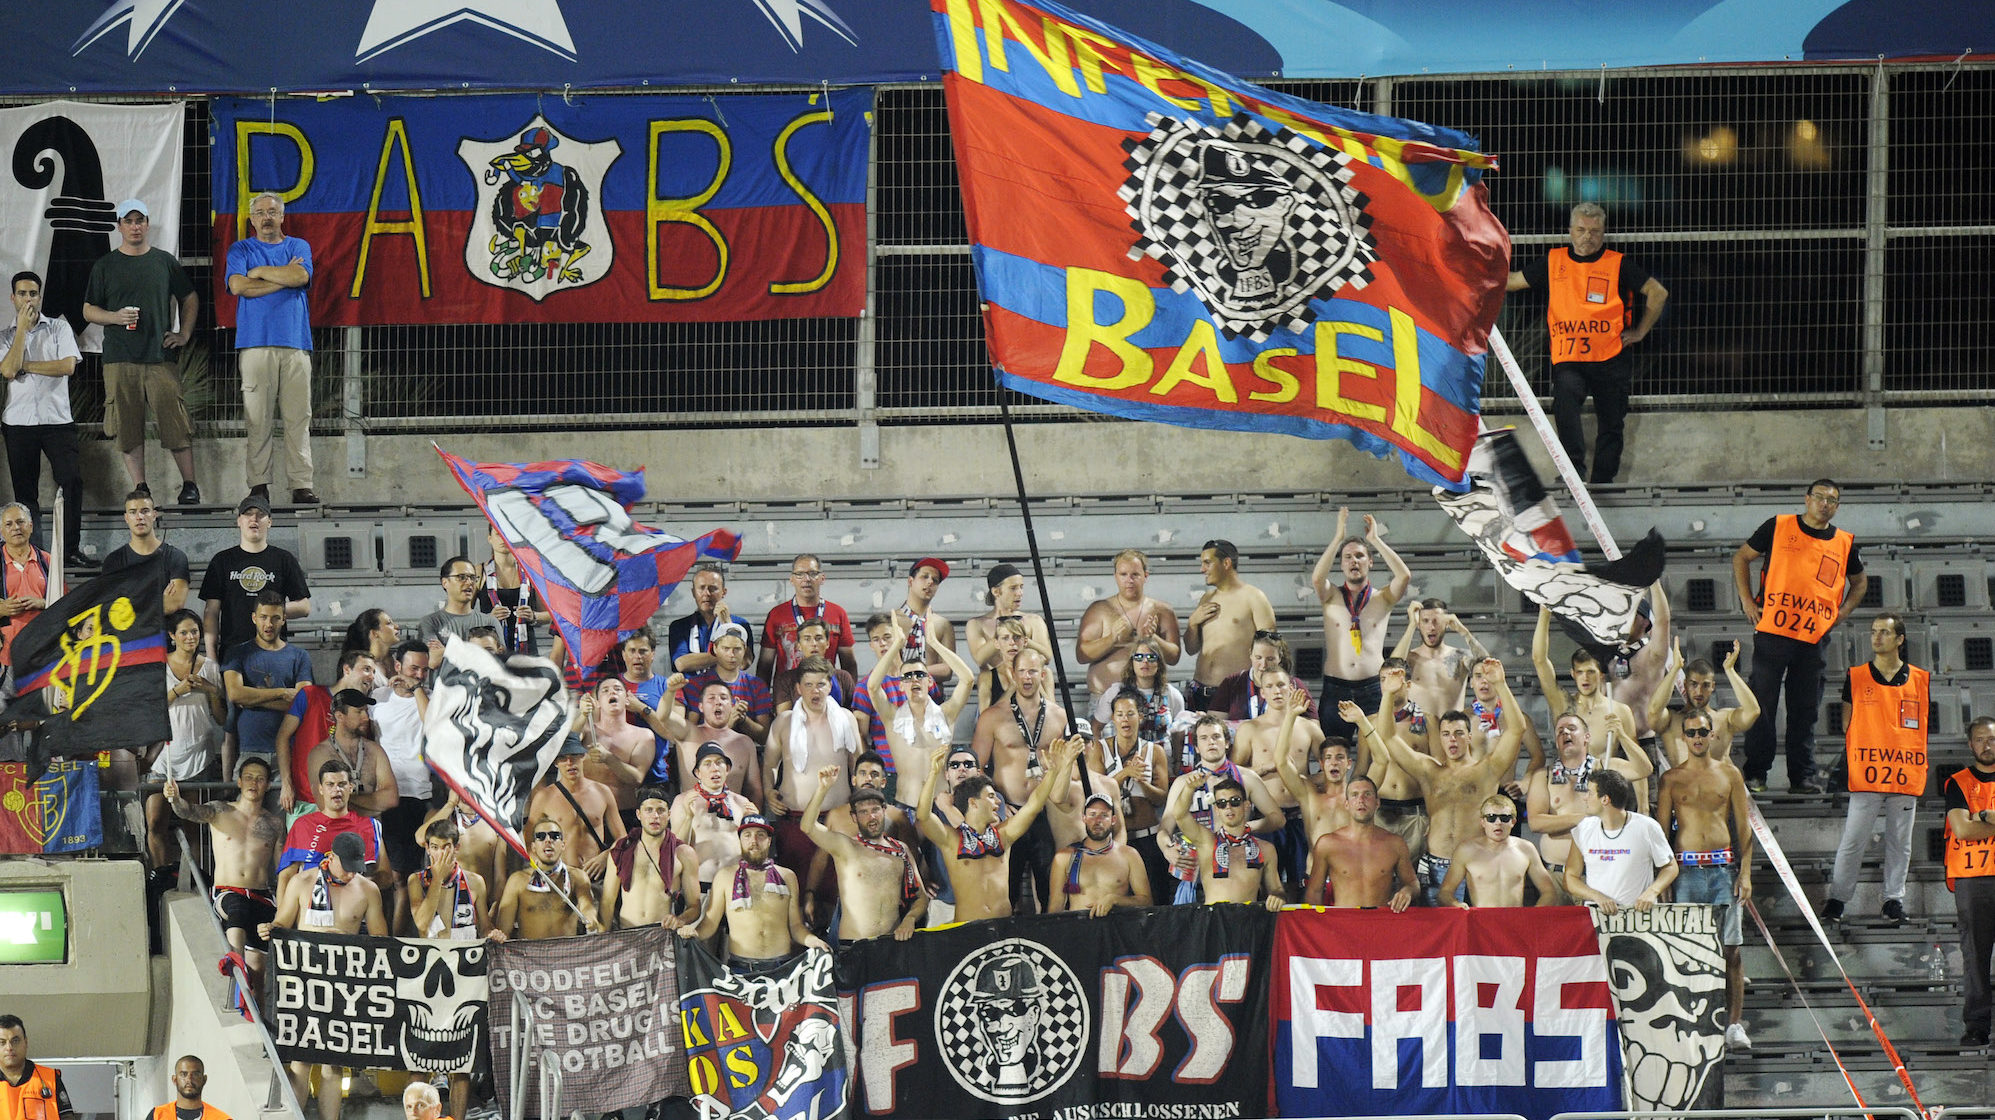 25.08.2015; Tel Aviv; Fussball Champions League FC Basel - Maccabi Tel Aviv; Fans aus Basel; (Steffen Schmidt/freshfocus)